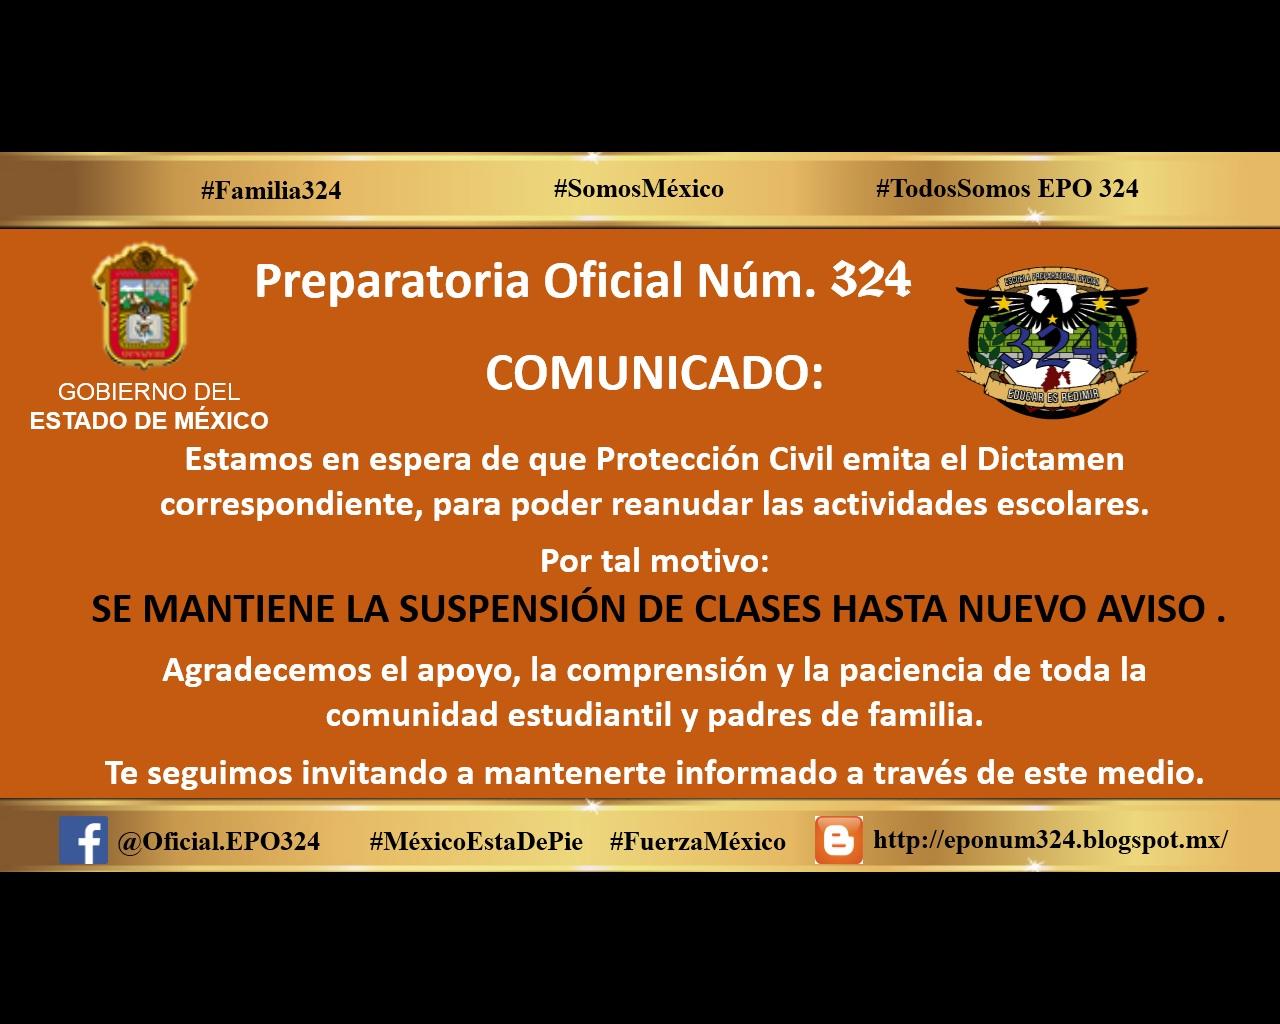 Escuela Preparatoria Oficial Núm. 324: 2017